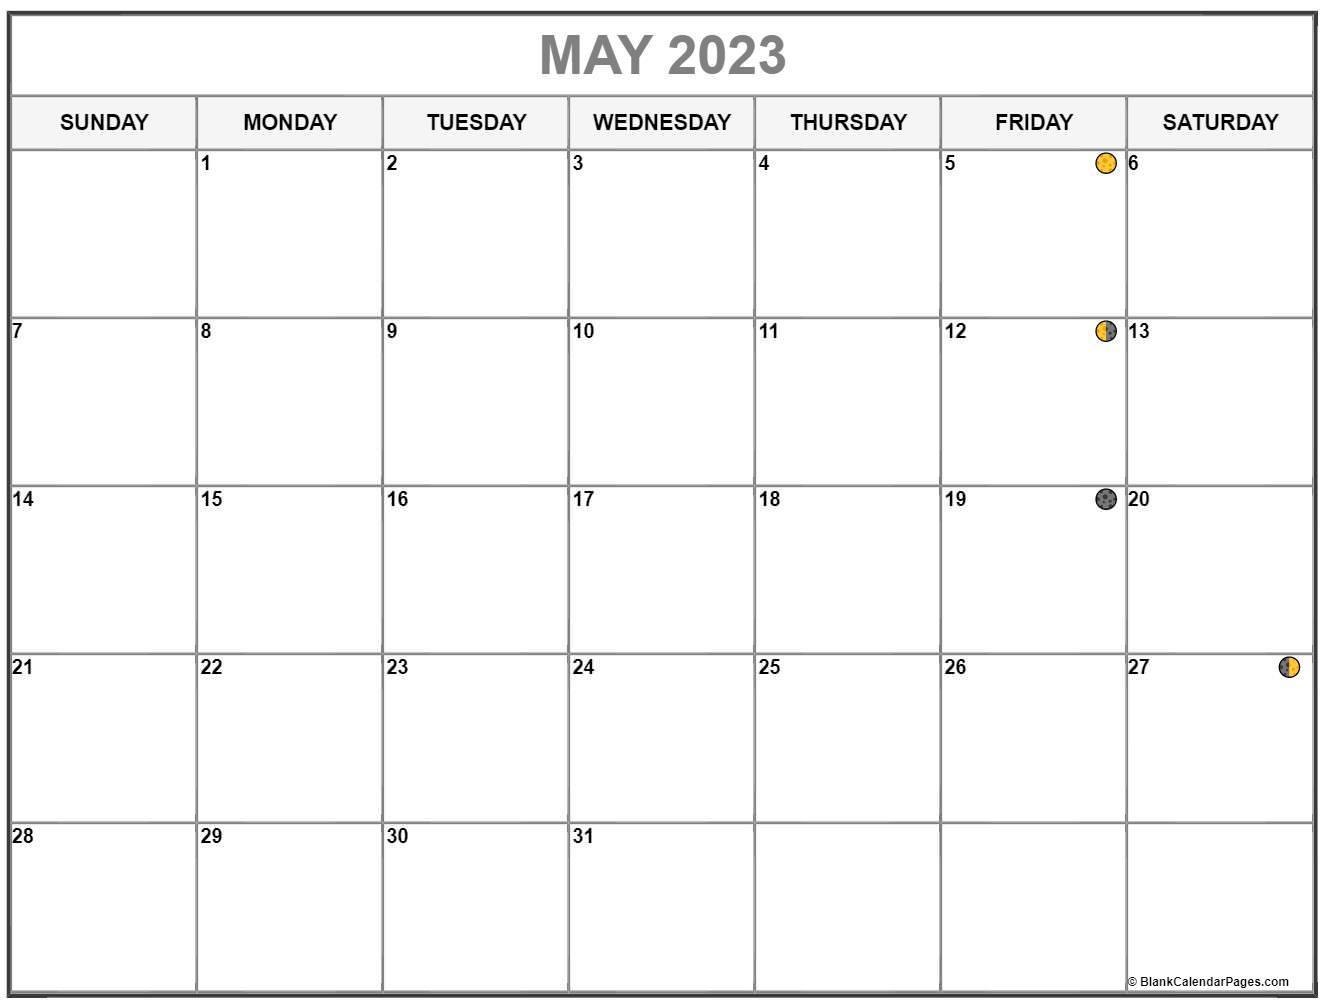 May Lunar Calendar